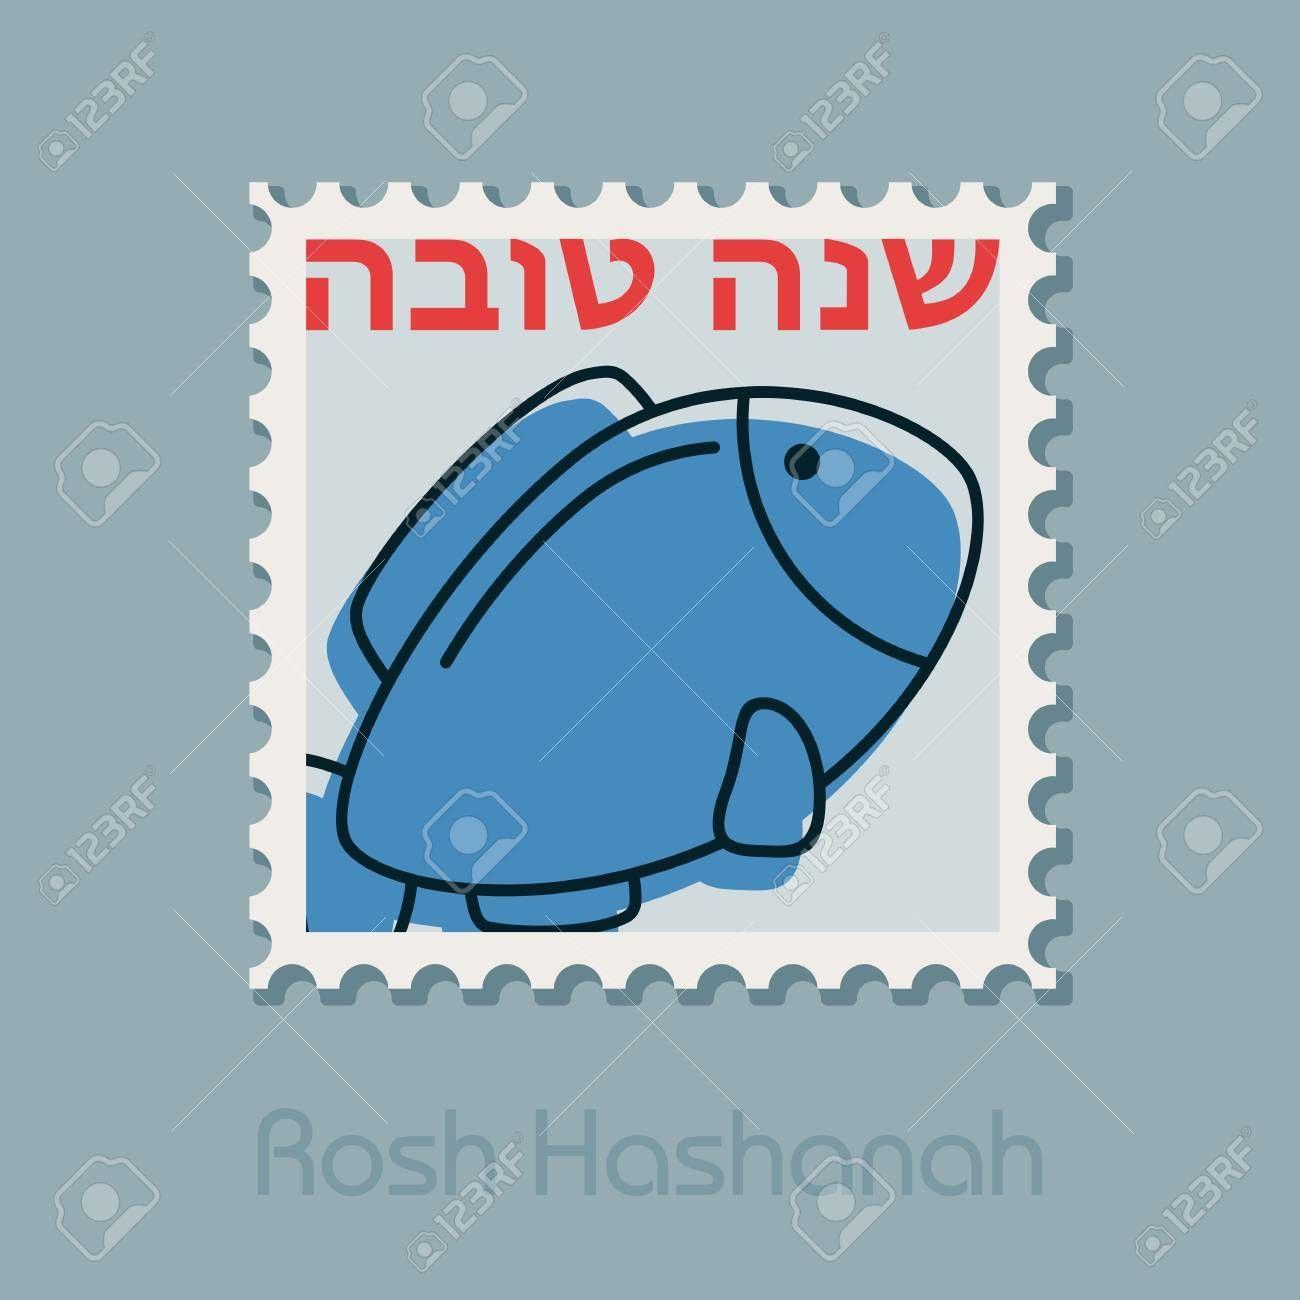 Fish Rosh Hashanah Stamp Shana Tova Happy And Sweet New Year In Hebrew Ad Stamp Shana Hash In 2020 Printable Holiday Card Rosh Hashanah Cards Rosh Hashanah